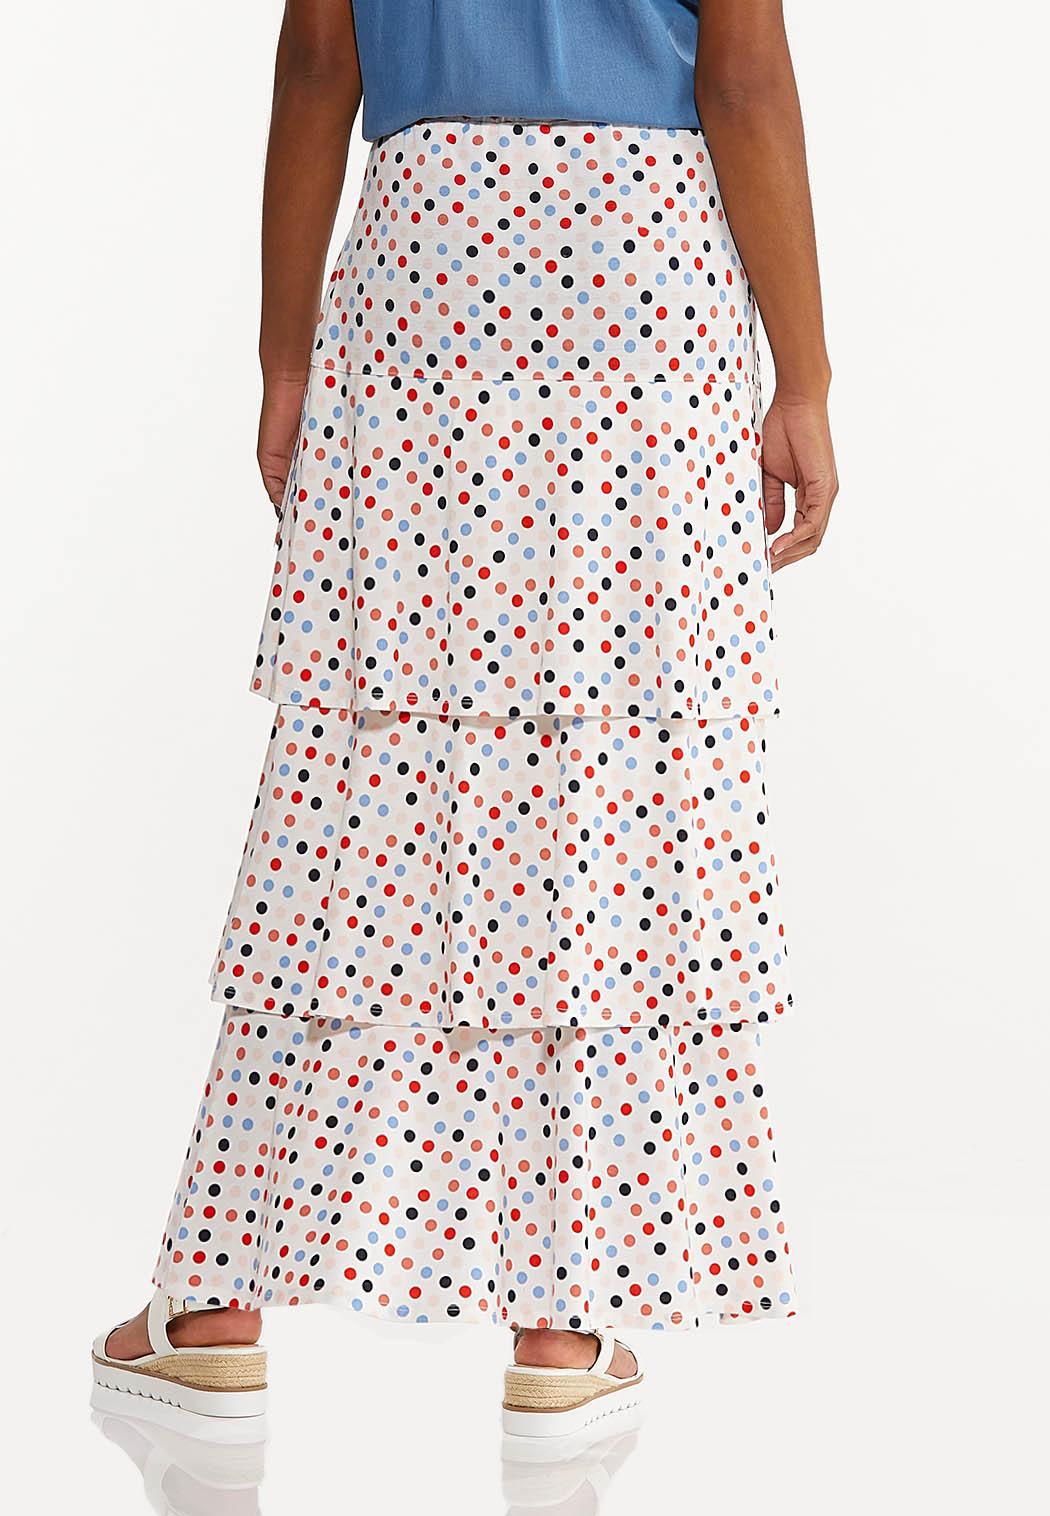 Tiered Polka Dot Skirt (Item #44529575)